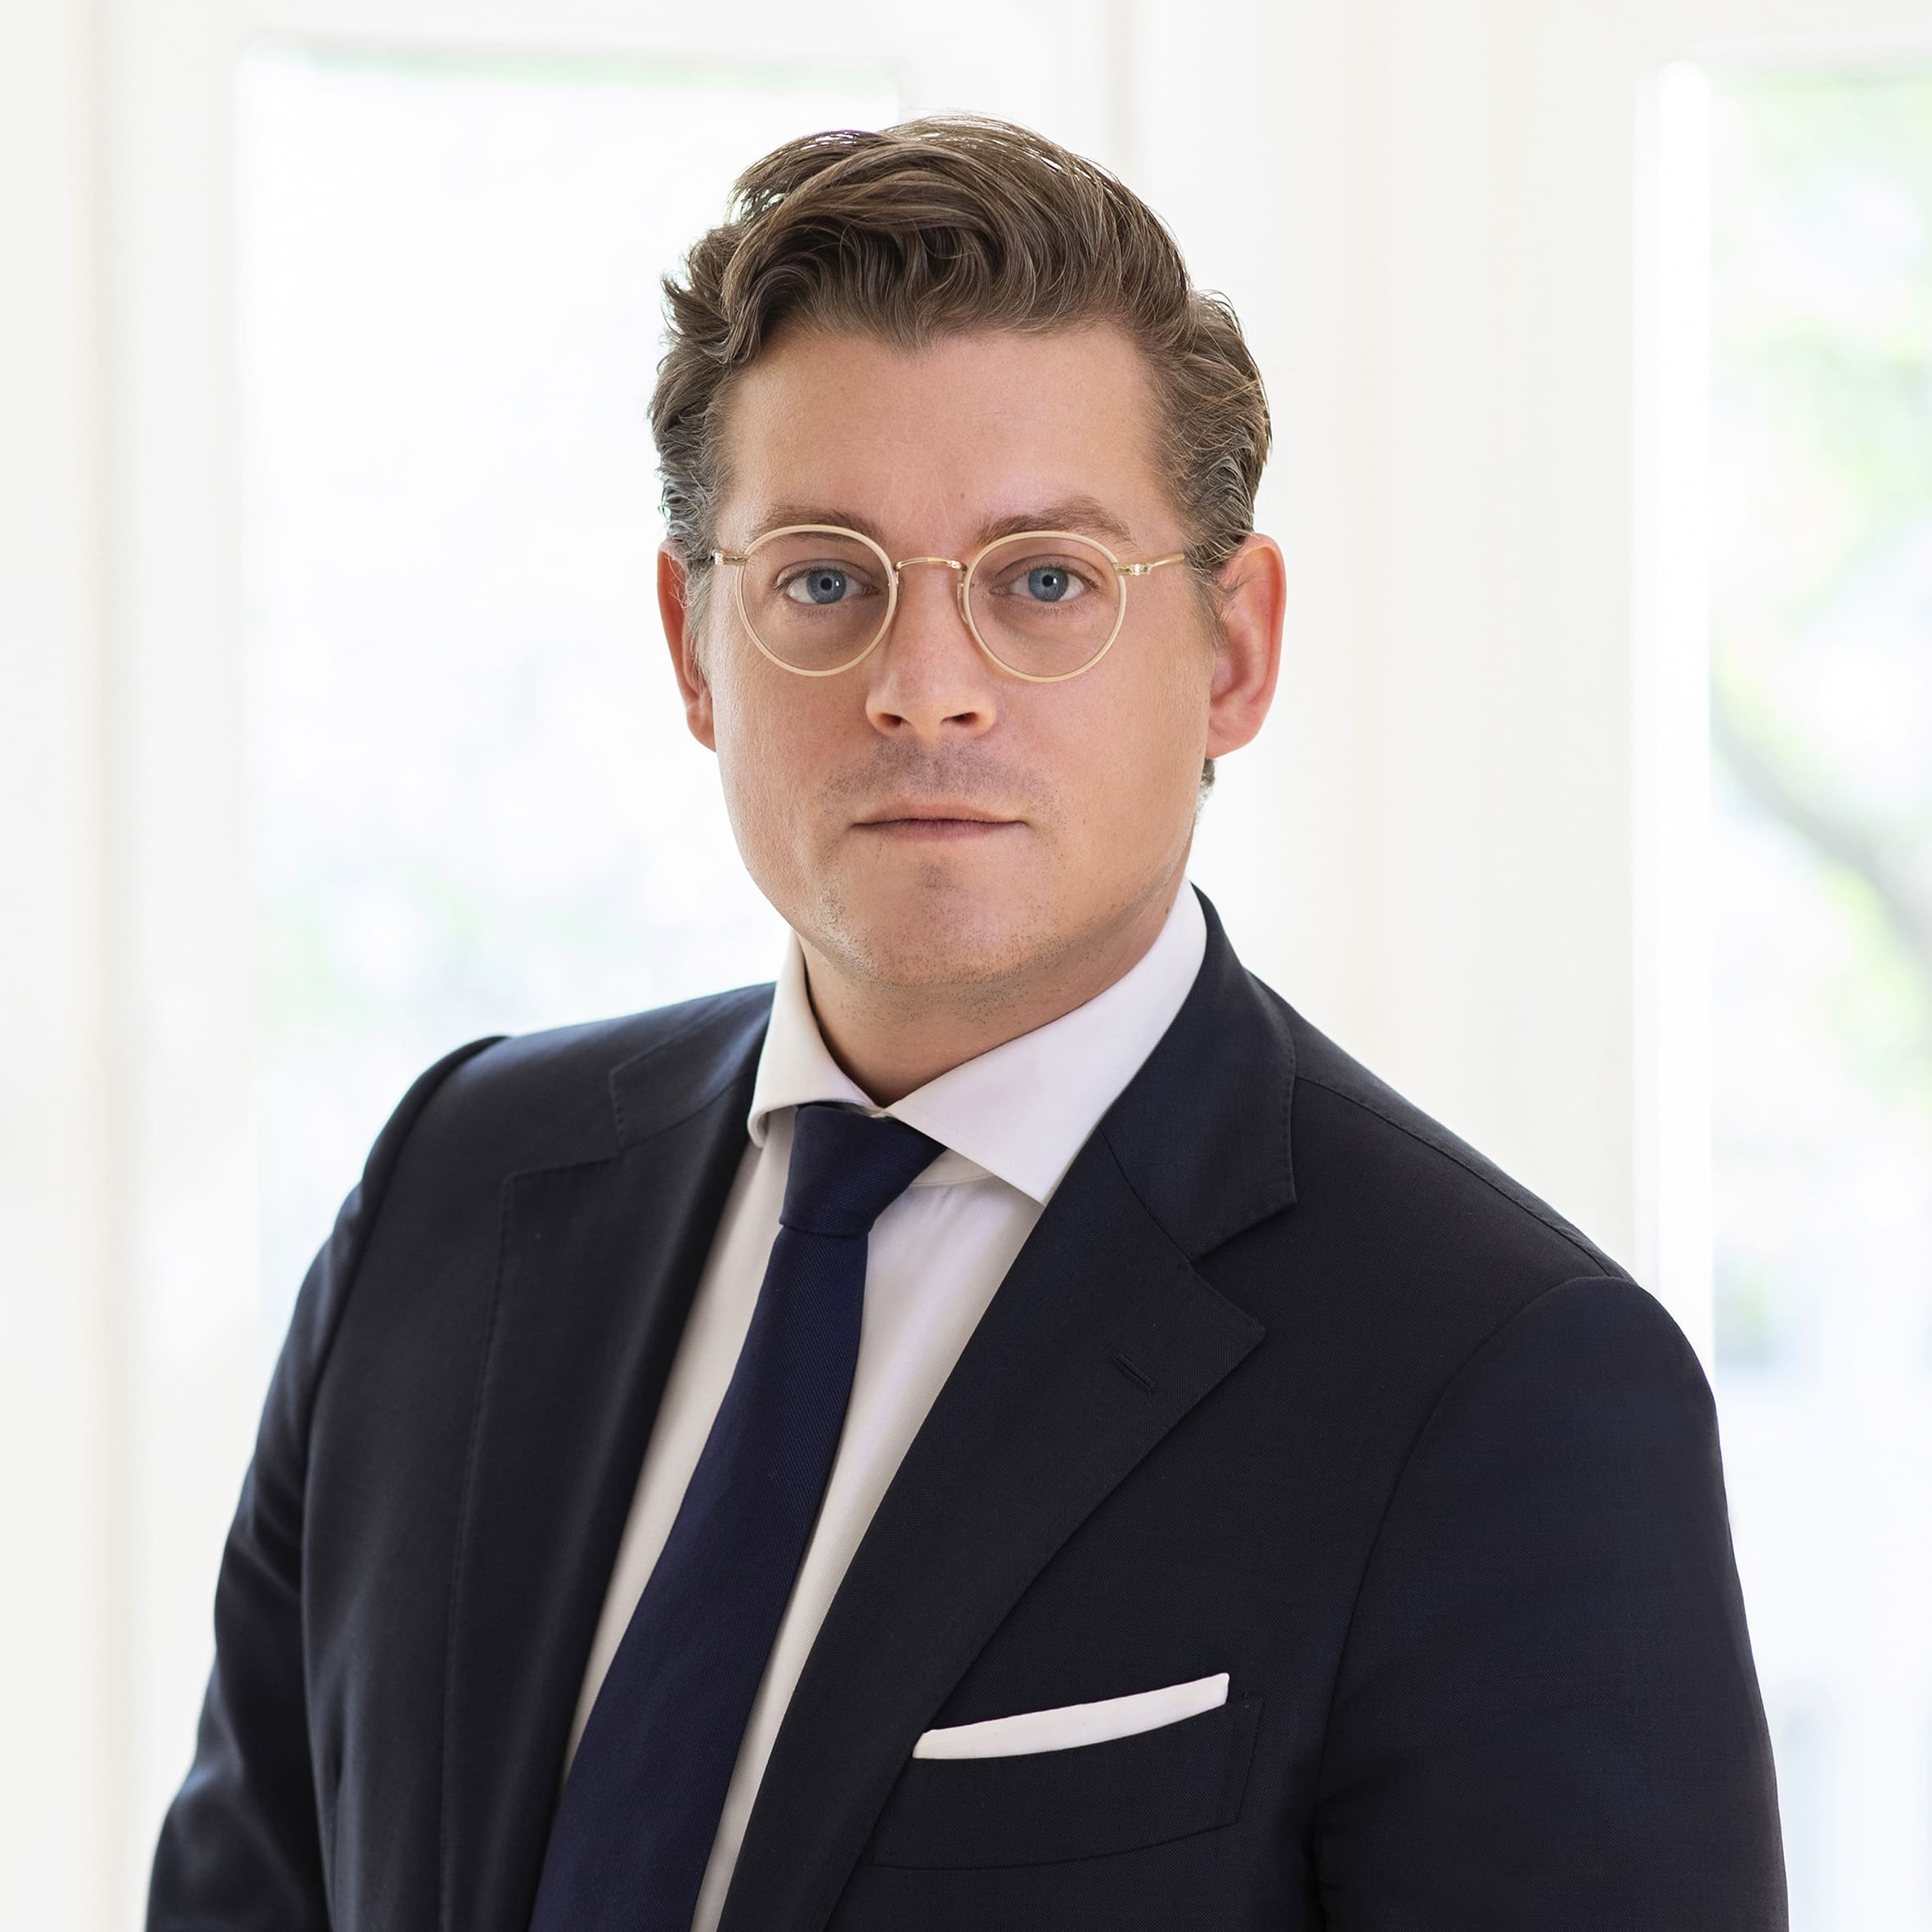 Kanzlei Plan A - Dr. Maximilian Kohlhof - Rechtsanwalt : Strafverteidiger